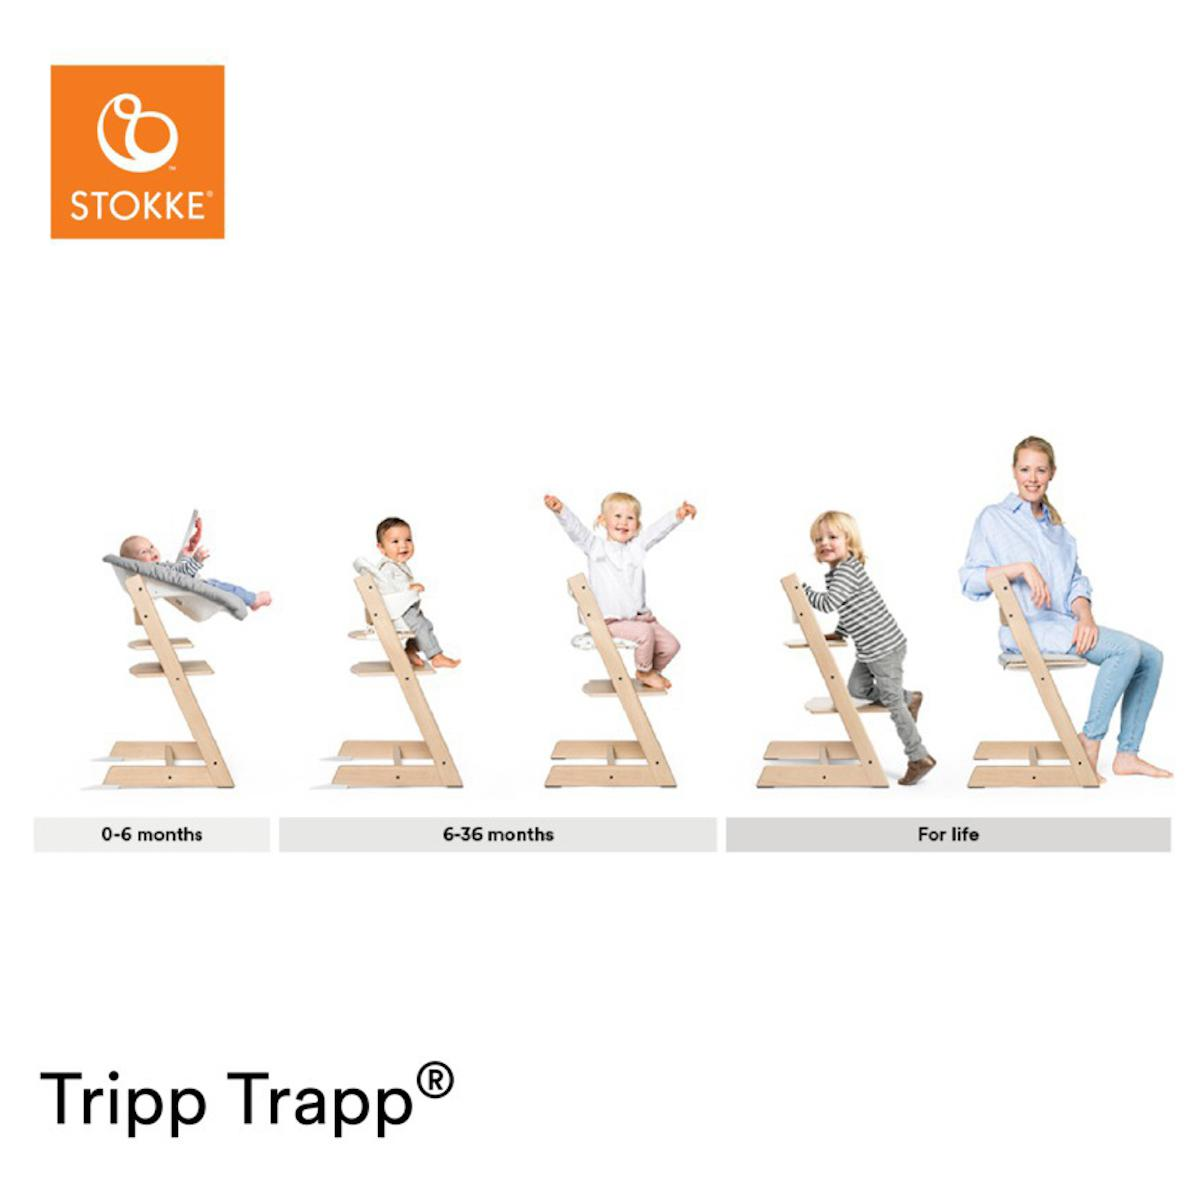 Trona bebé TRIPP TRAPP Stokke roble natural